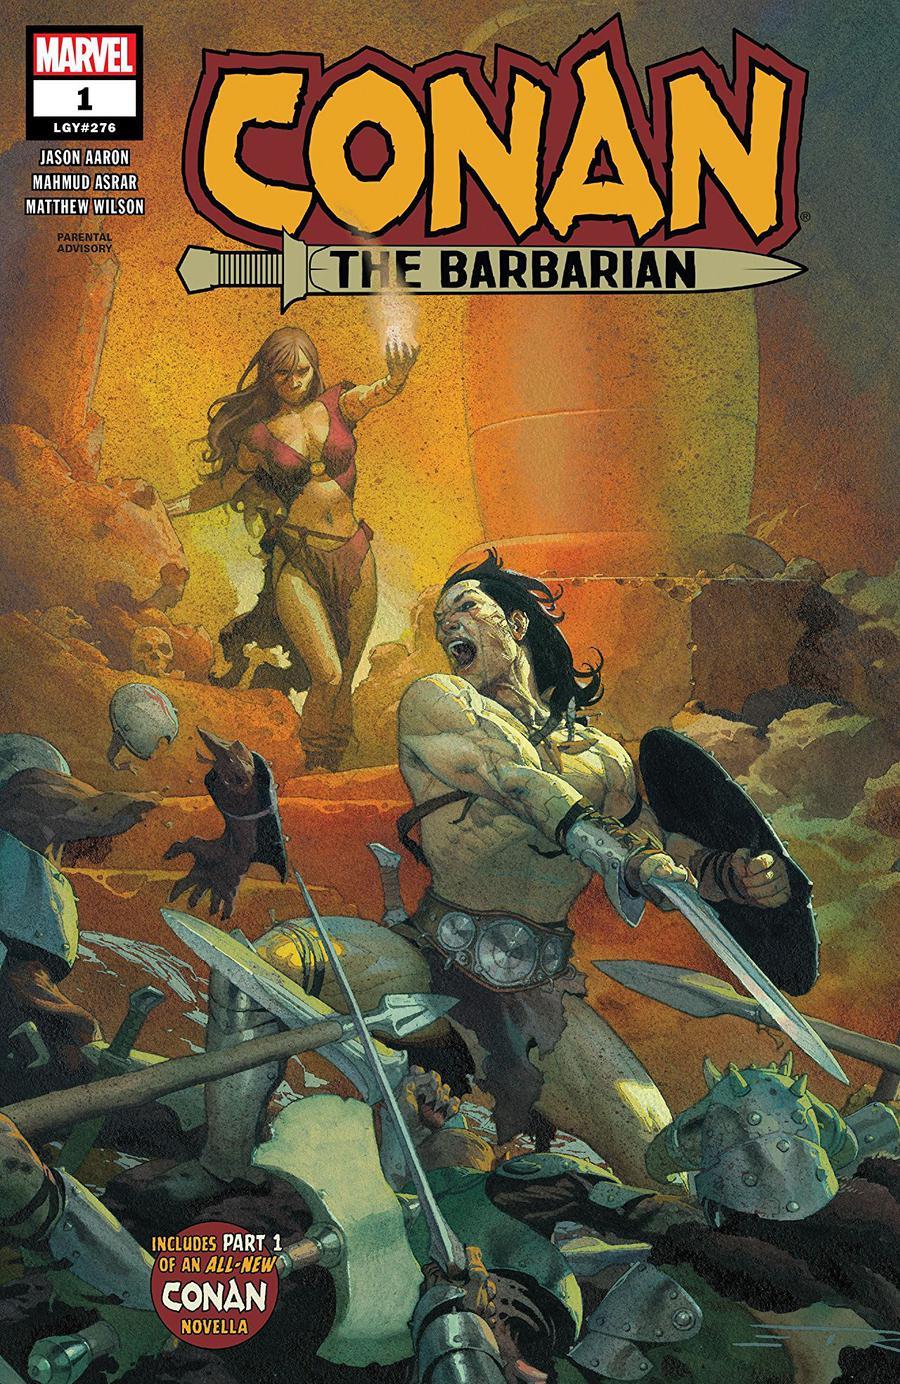 Conan The Barbarian Vol 4 #1 Cover A 1st Ptg Regular Esad Ribic Cover